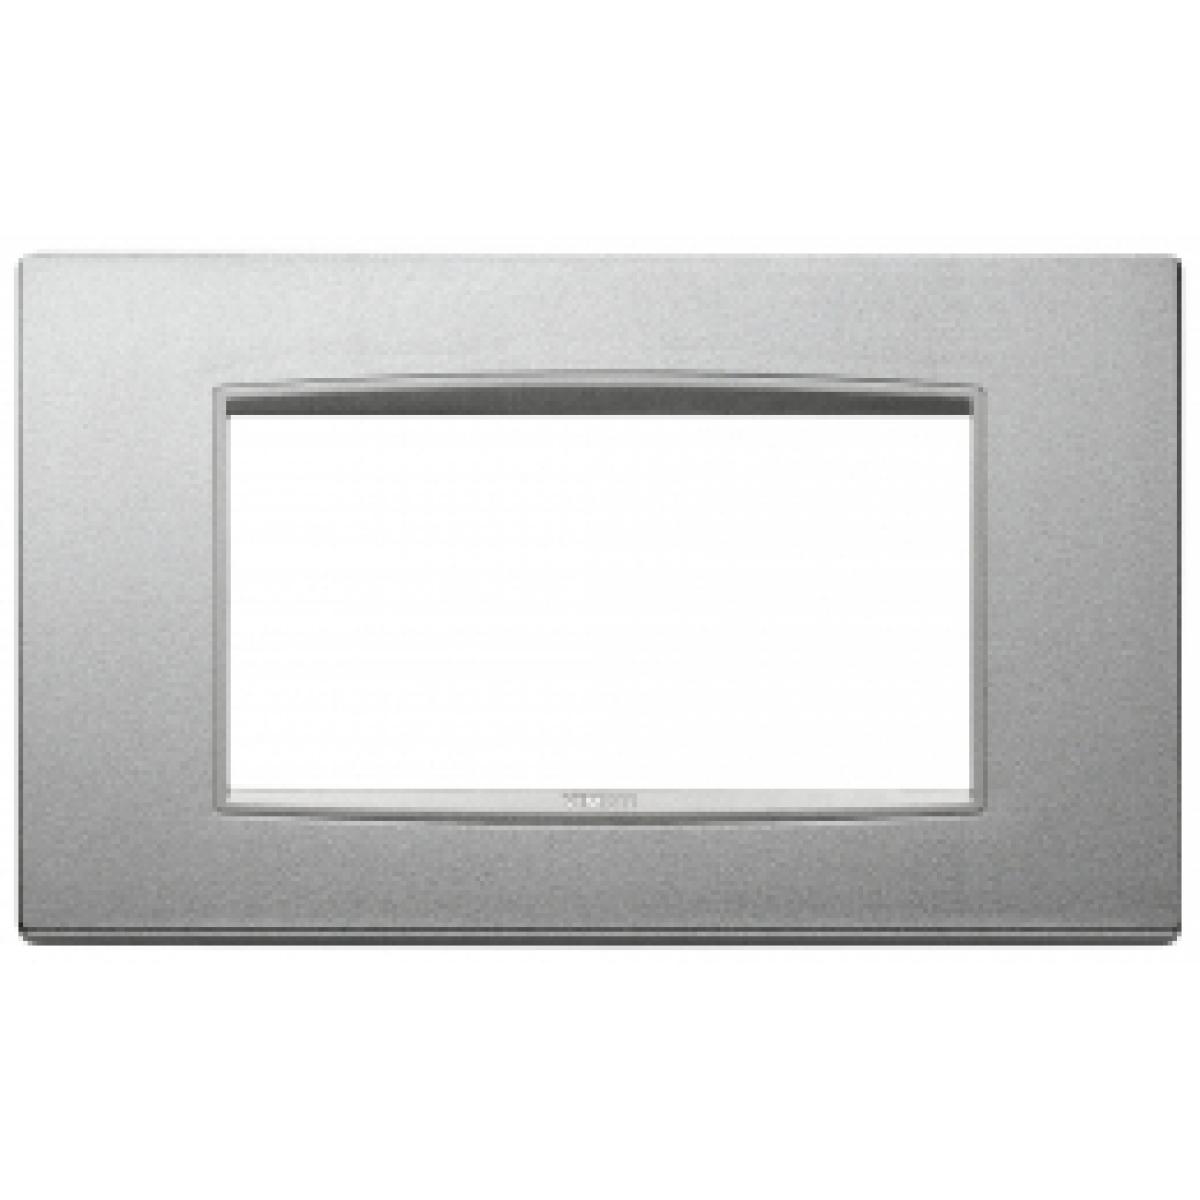 Eikon next vimar  placca classic 4 posti colore argento matto 20654.N13